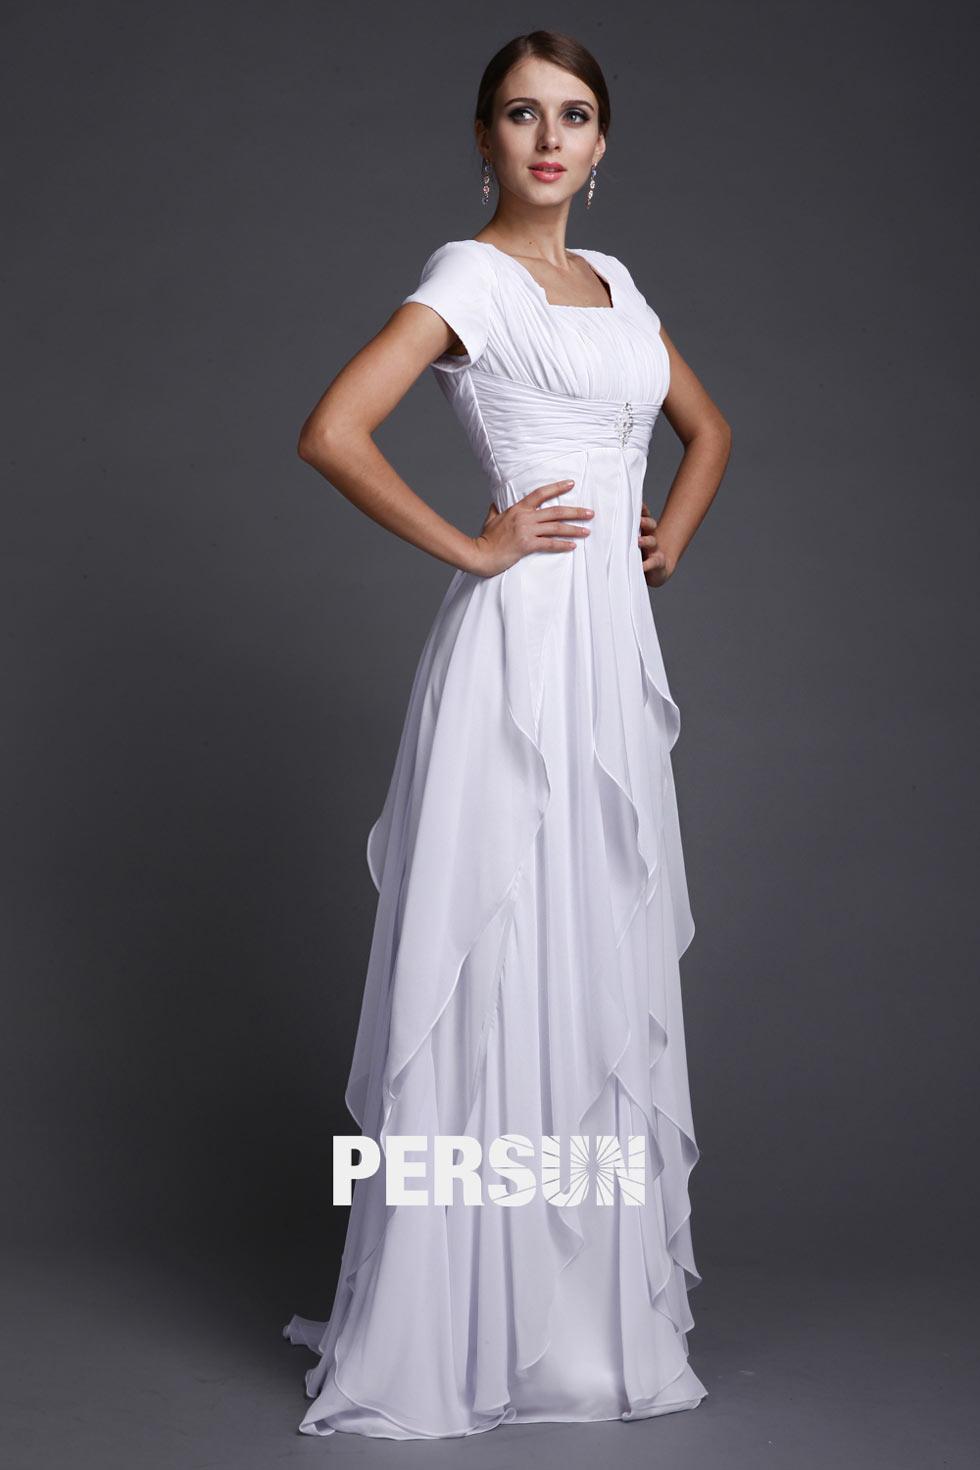 397e093fc626 Robe manche courte pour mariage robe a bustier